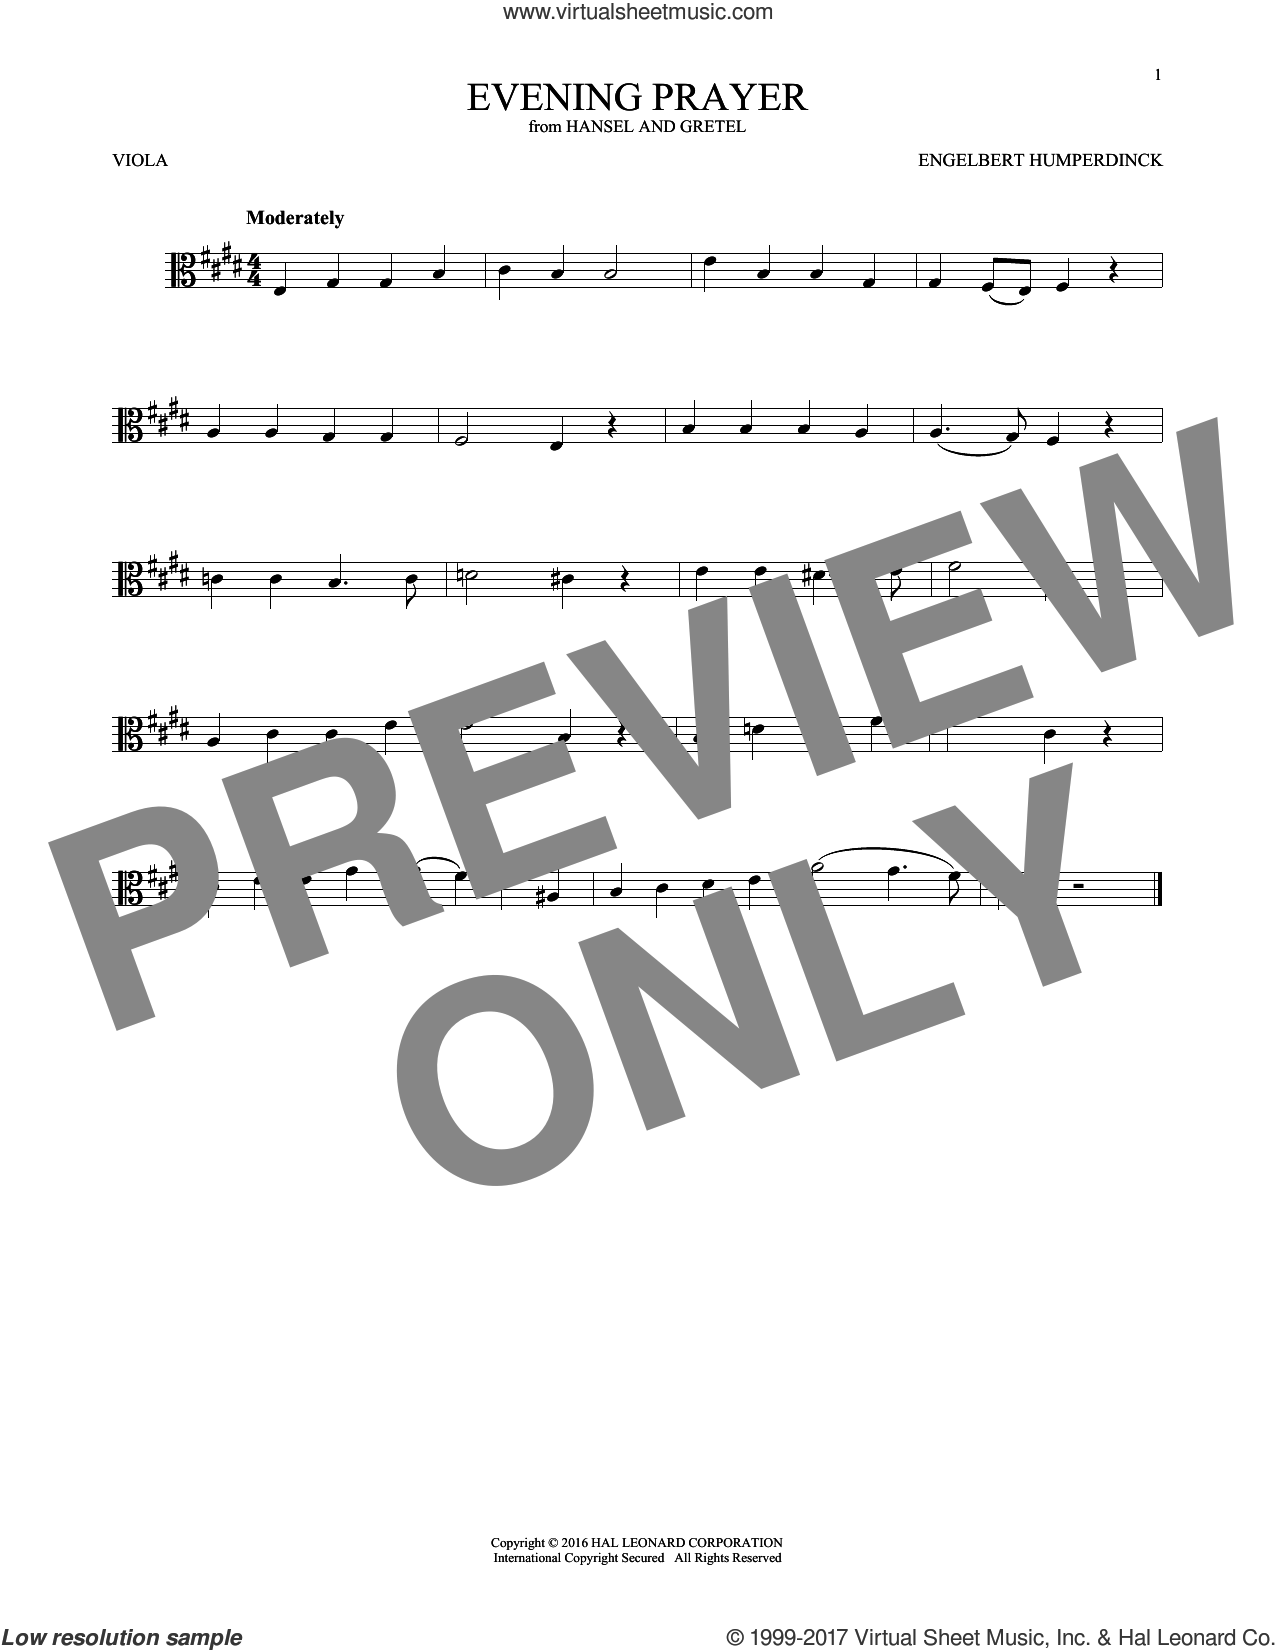 Evening Prayer sheet music for viola solo by Engelbert Humperdinck, intermediate skill level